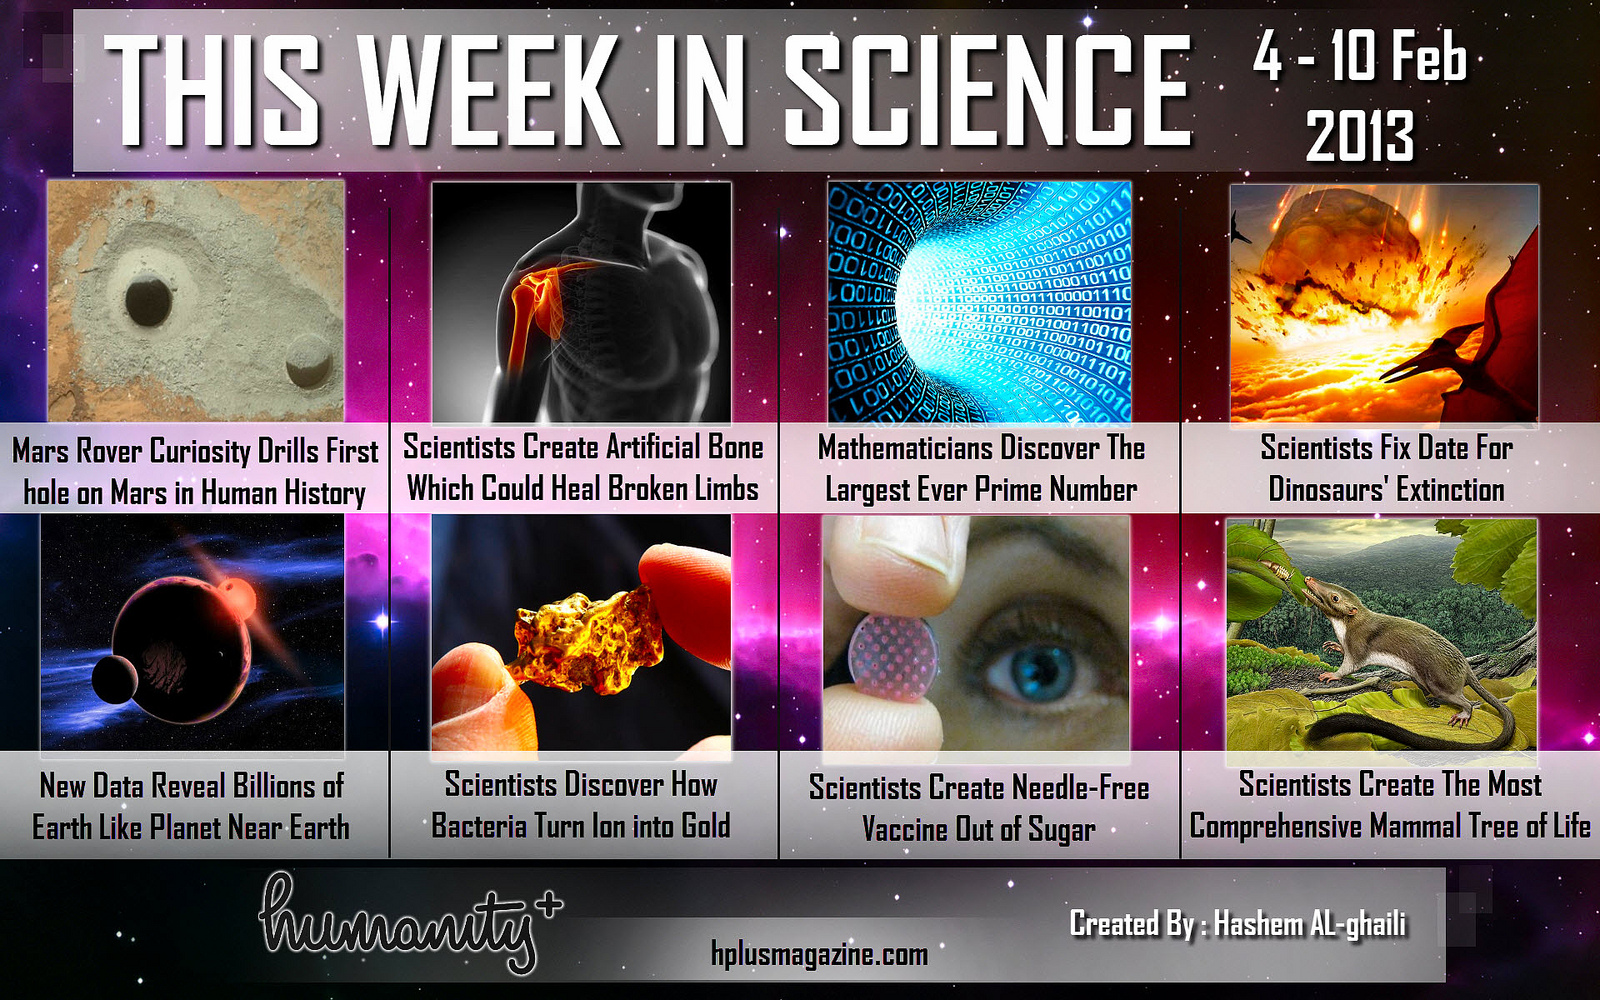 thisweekinscience